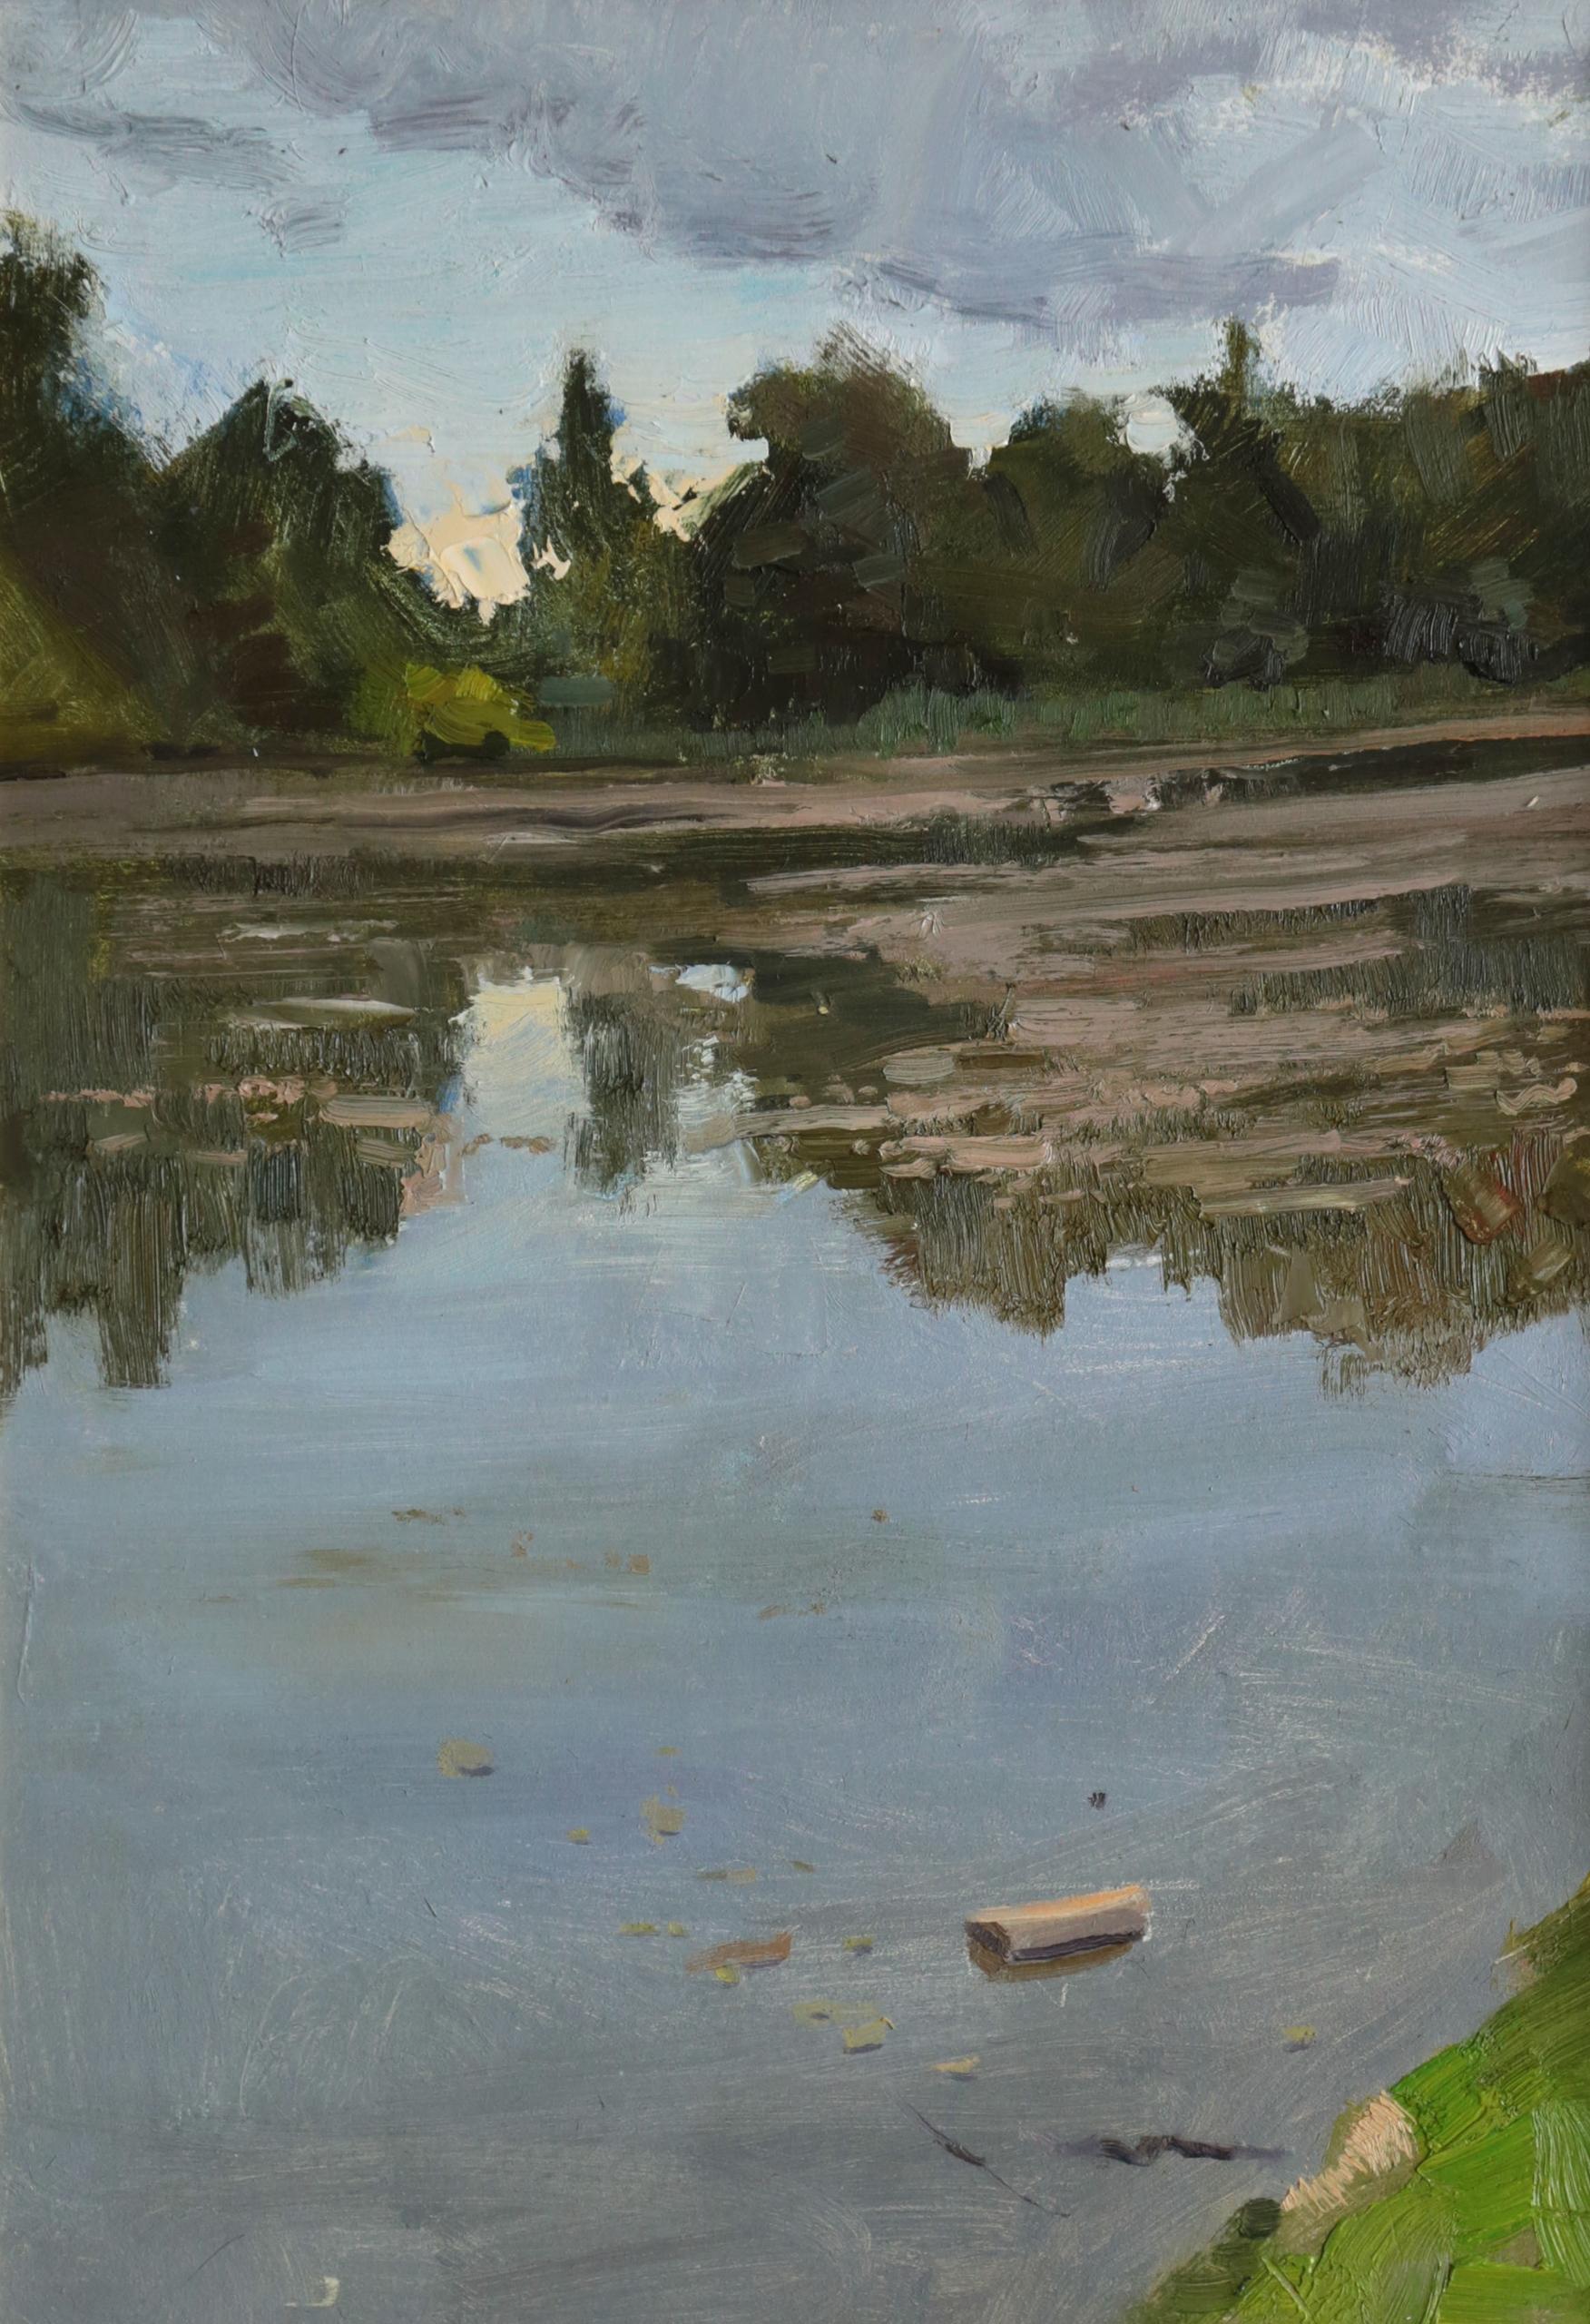 2015, 33x48 cm. Evening - art, oilpainting - georgemamchur | ello